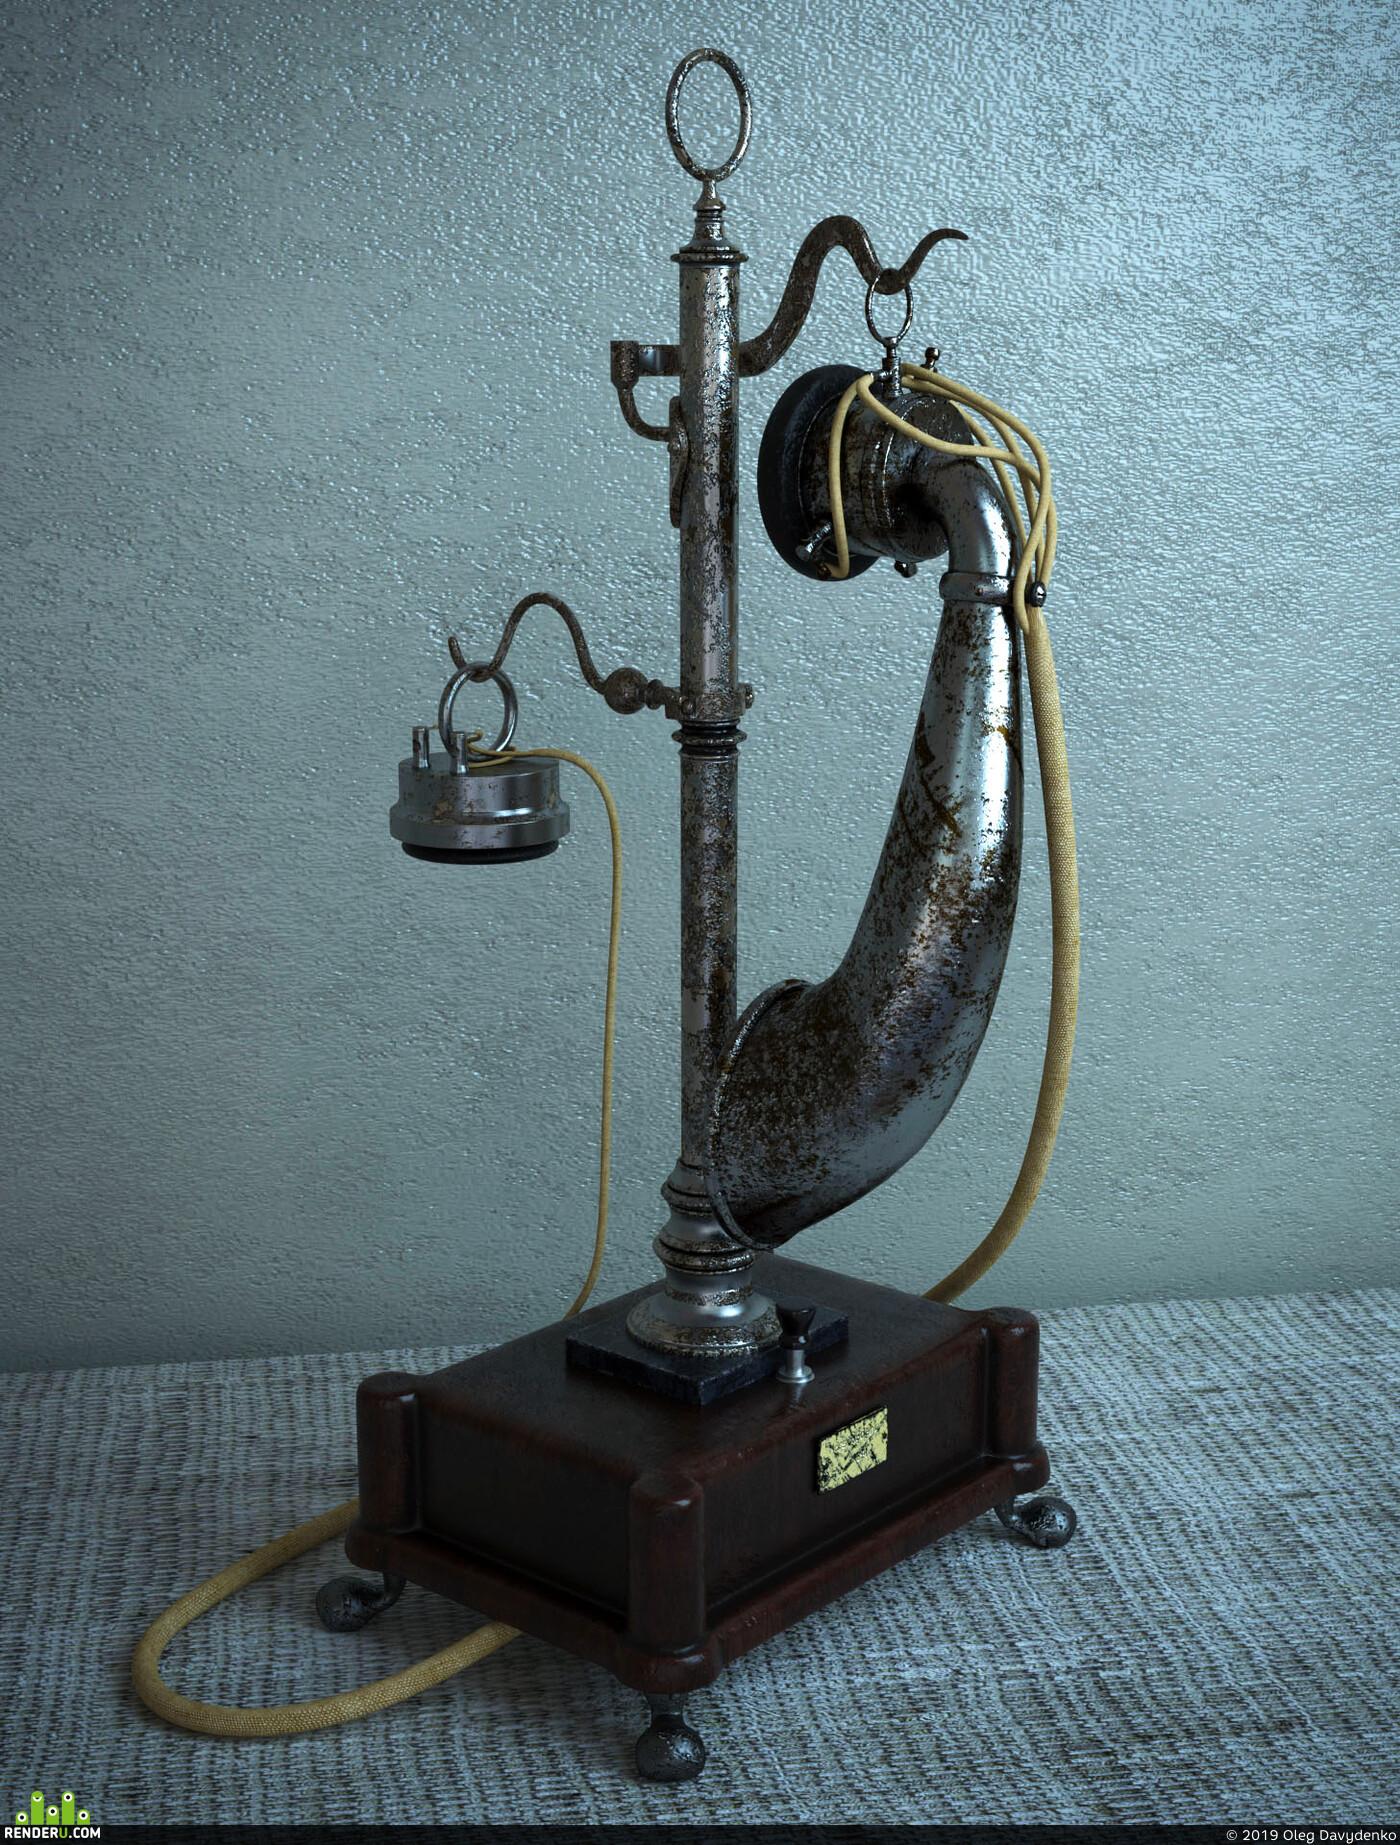 telephone, rust